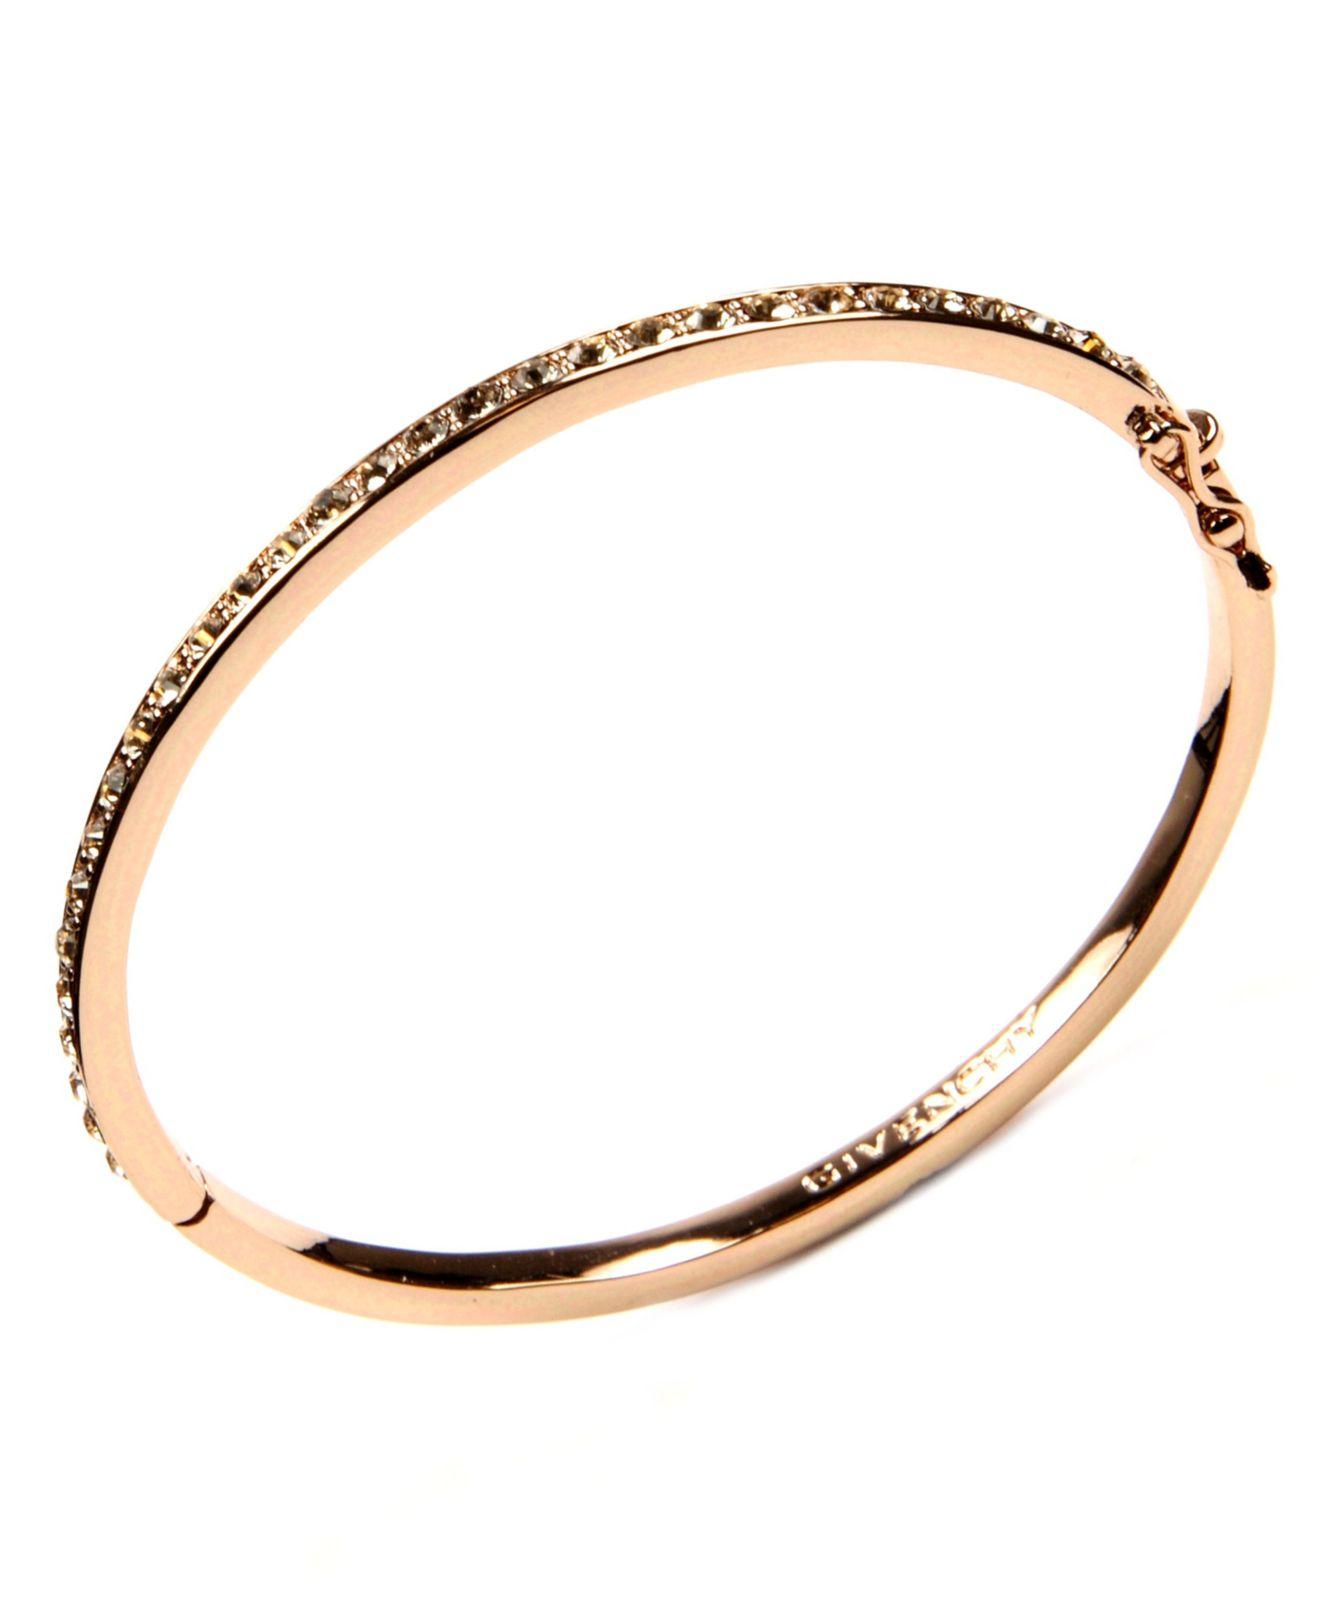 Givenchy Silk Swarovski Element Bangle In Pink Rose Gold